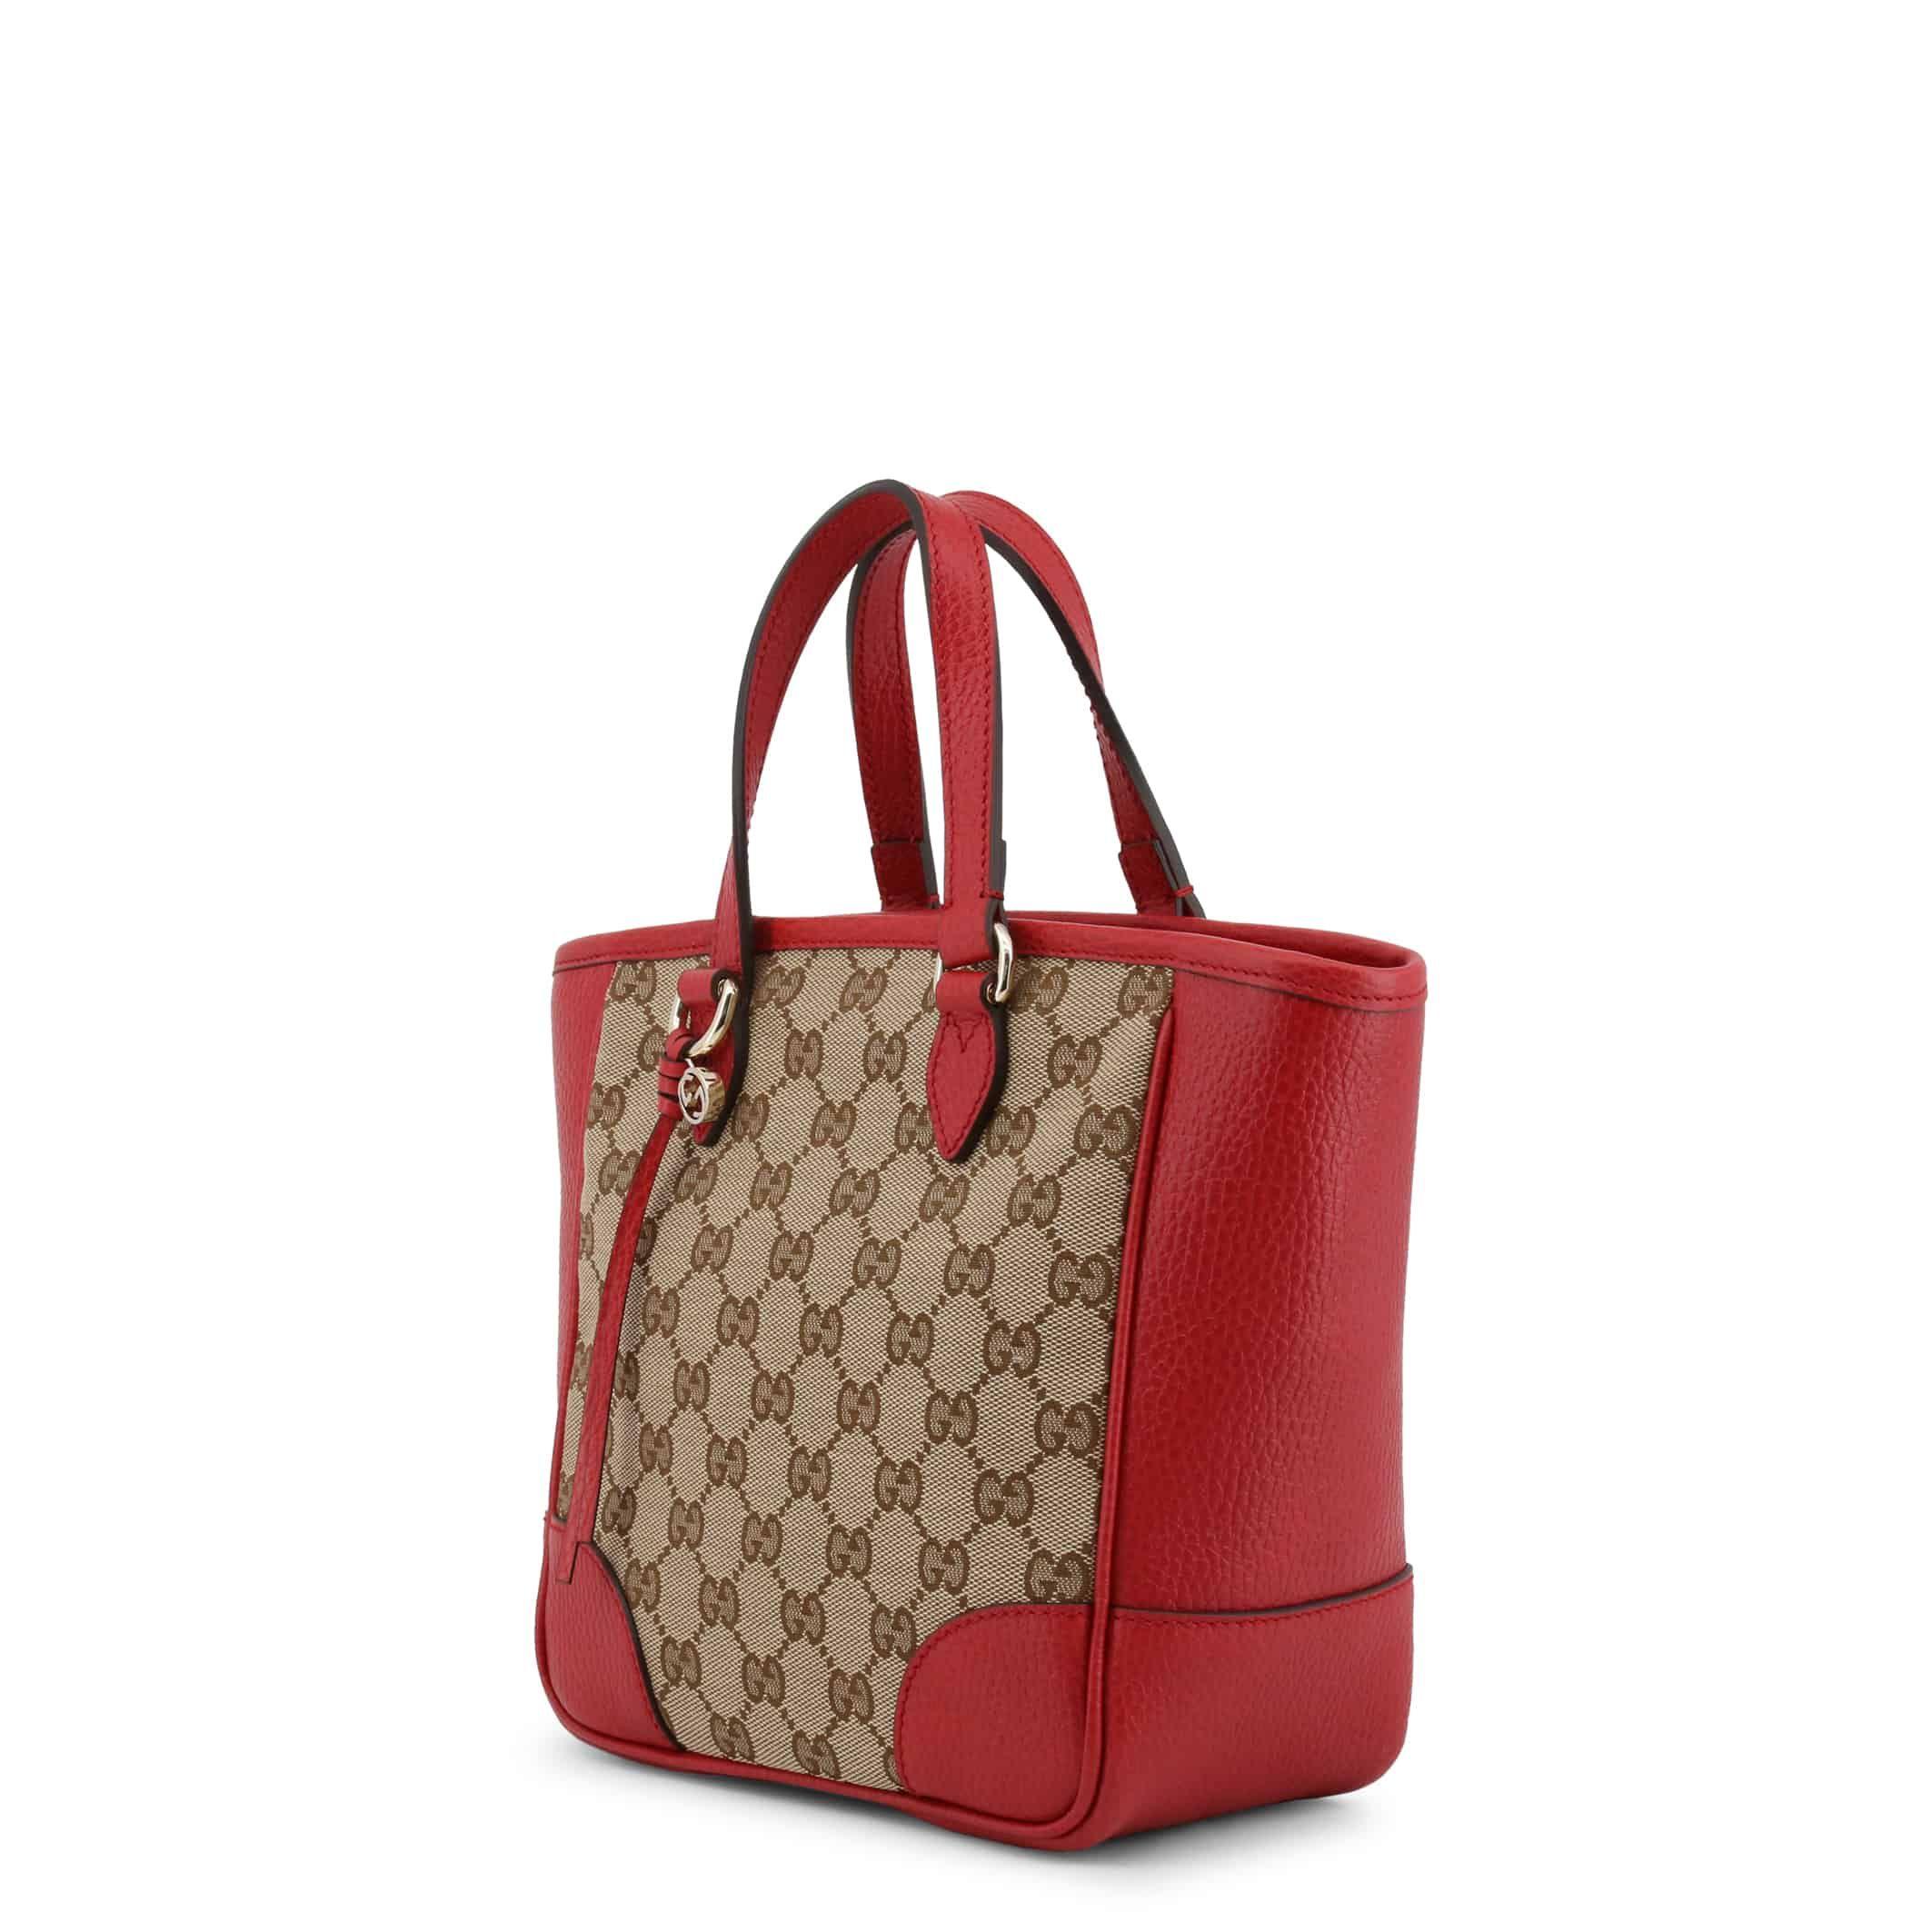 Gucci – 449241_KY9LG